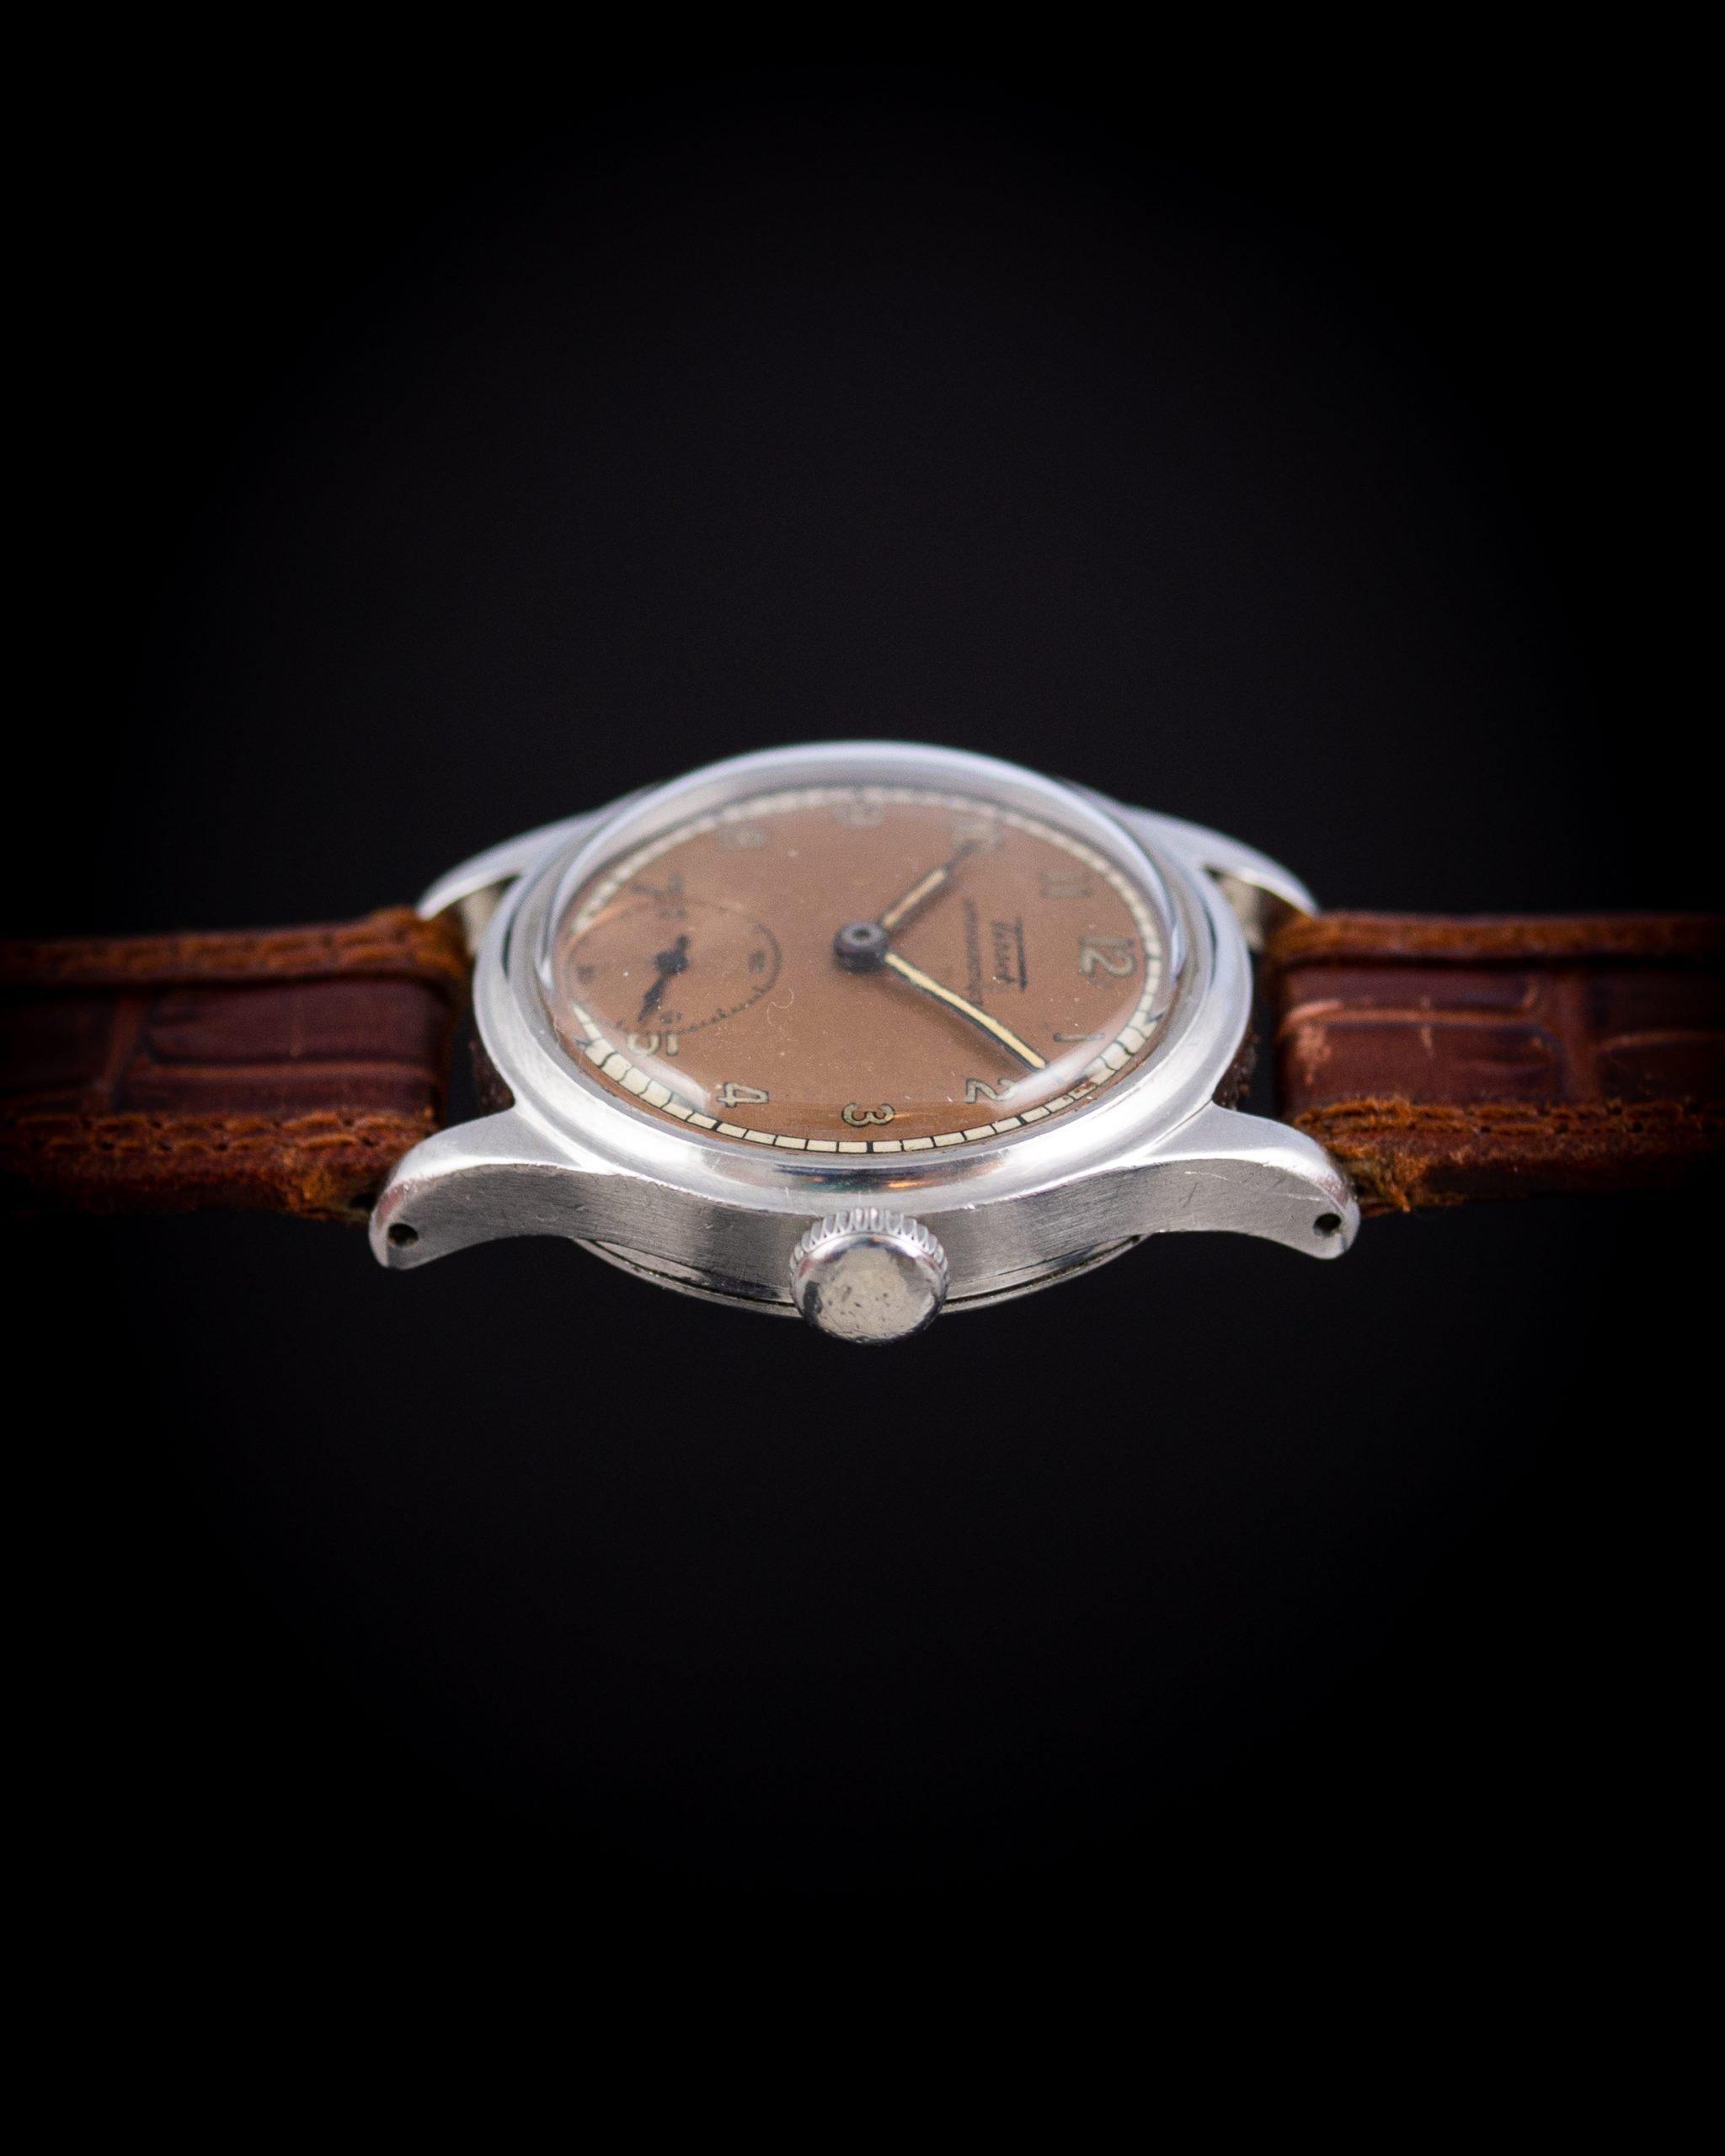 Vintage Tissot Antimagnetique salmon dial